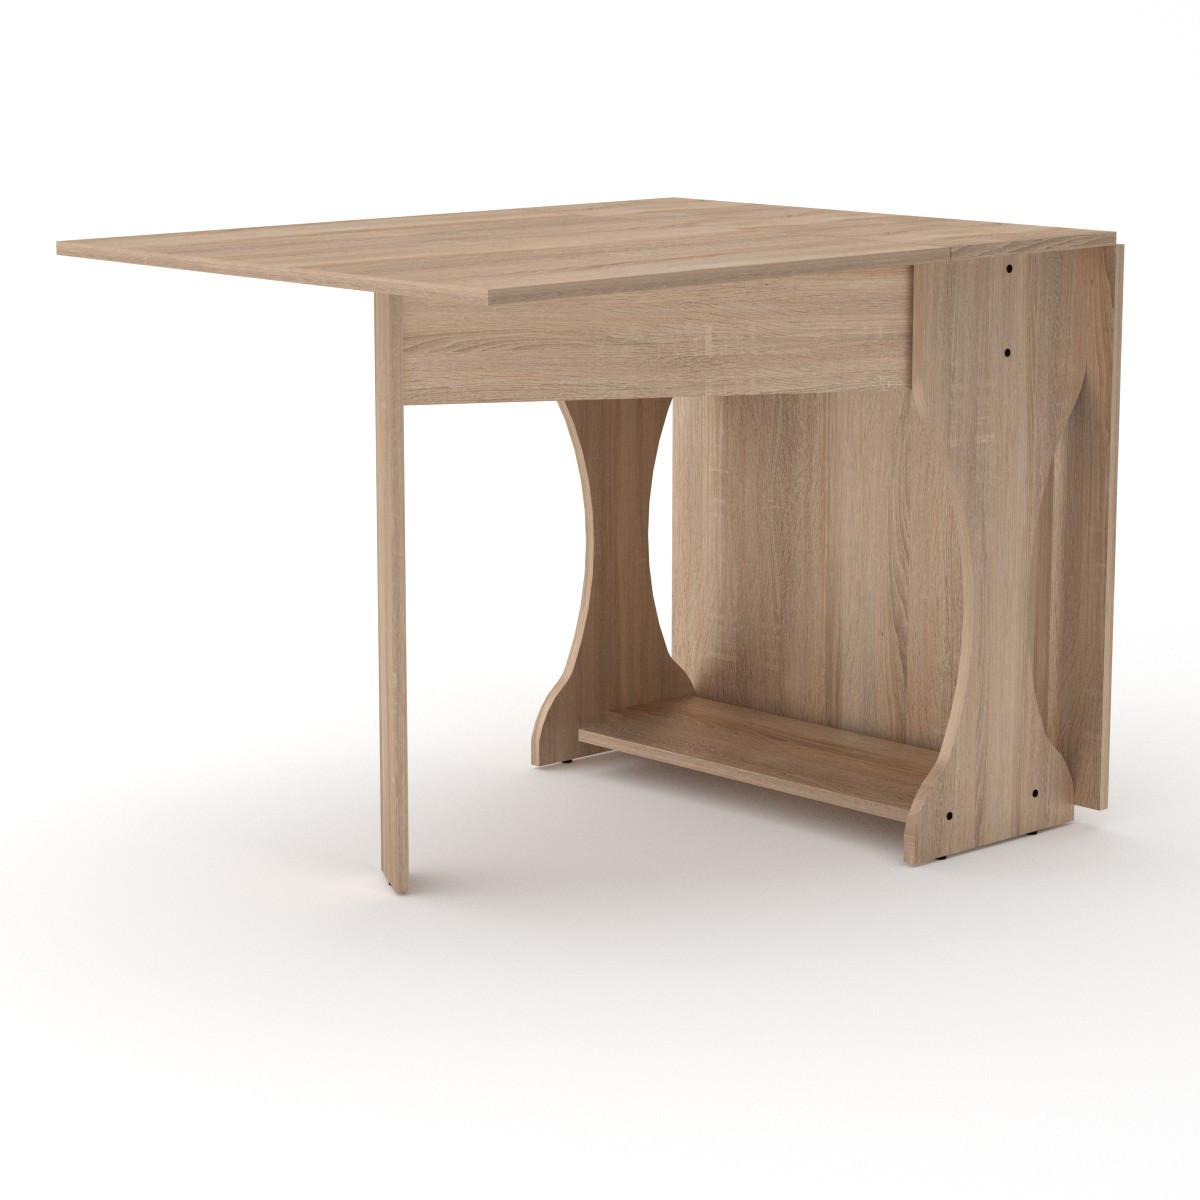 Стол книжка 4 дуб сонома Компанит (170х76х74 см)